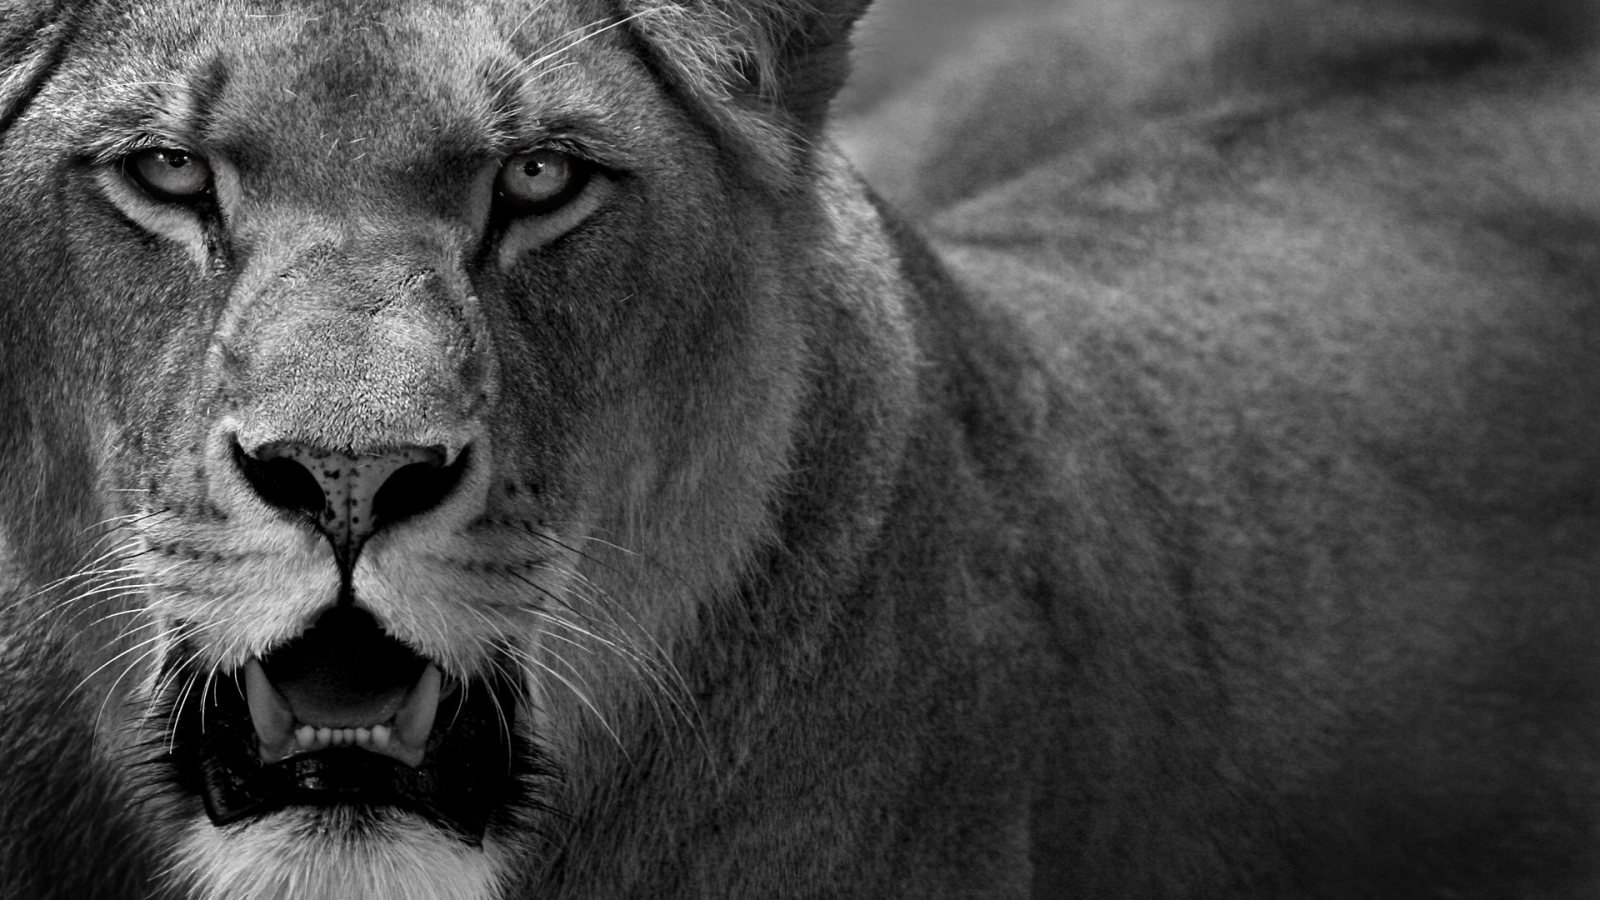 Liones in black and white HD Wallpaper   HD Wallpaper Zone 1600x900